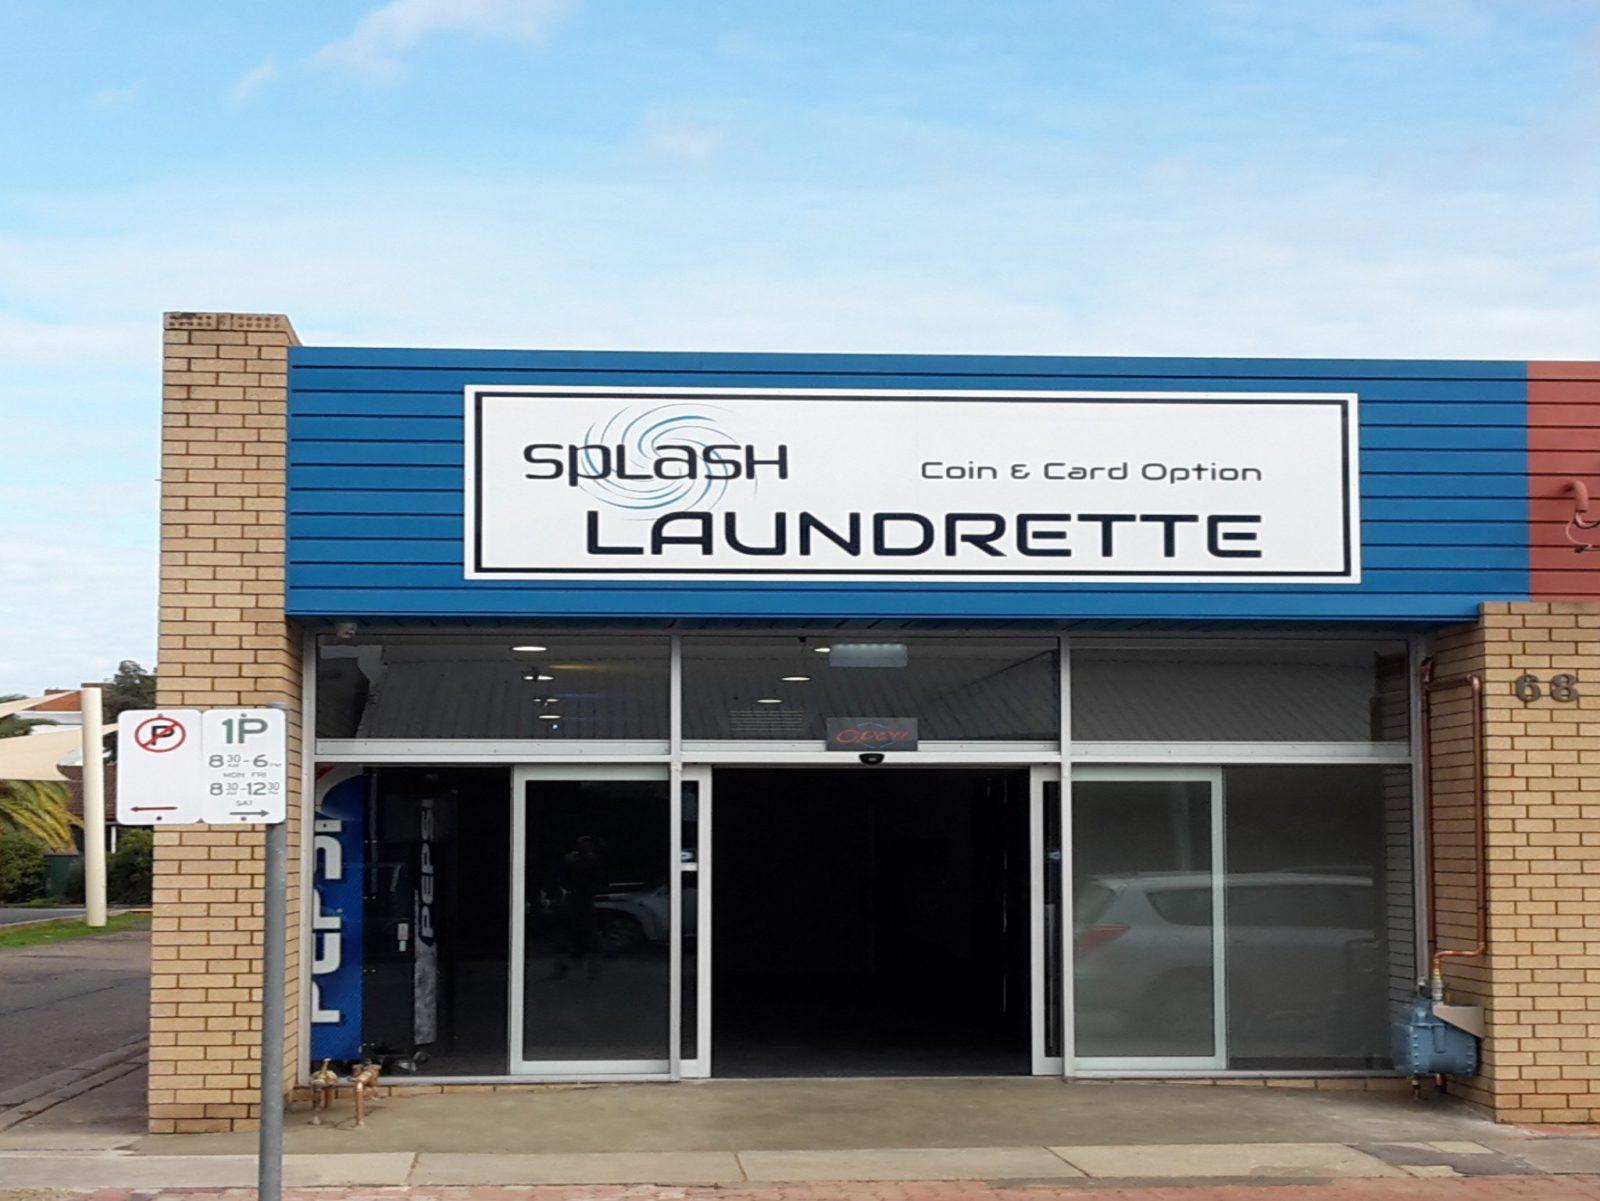 Splash Laundrette, Wagga Wagga